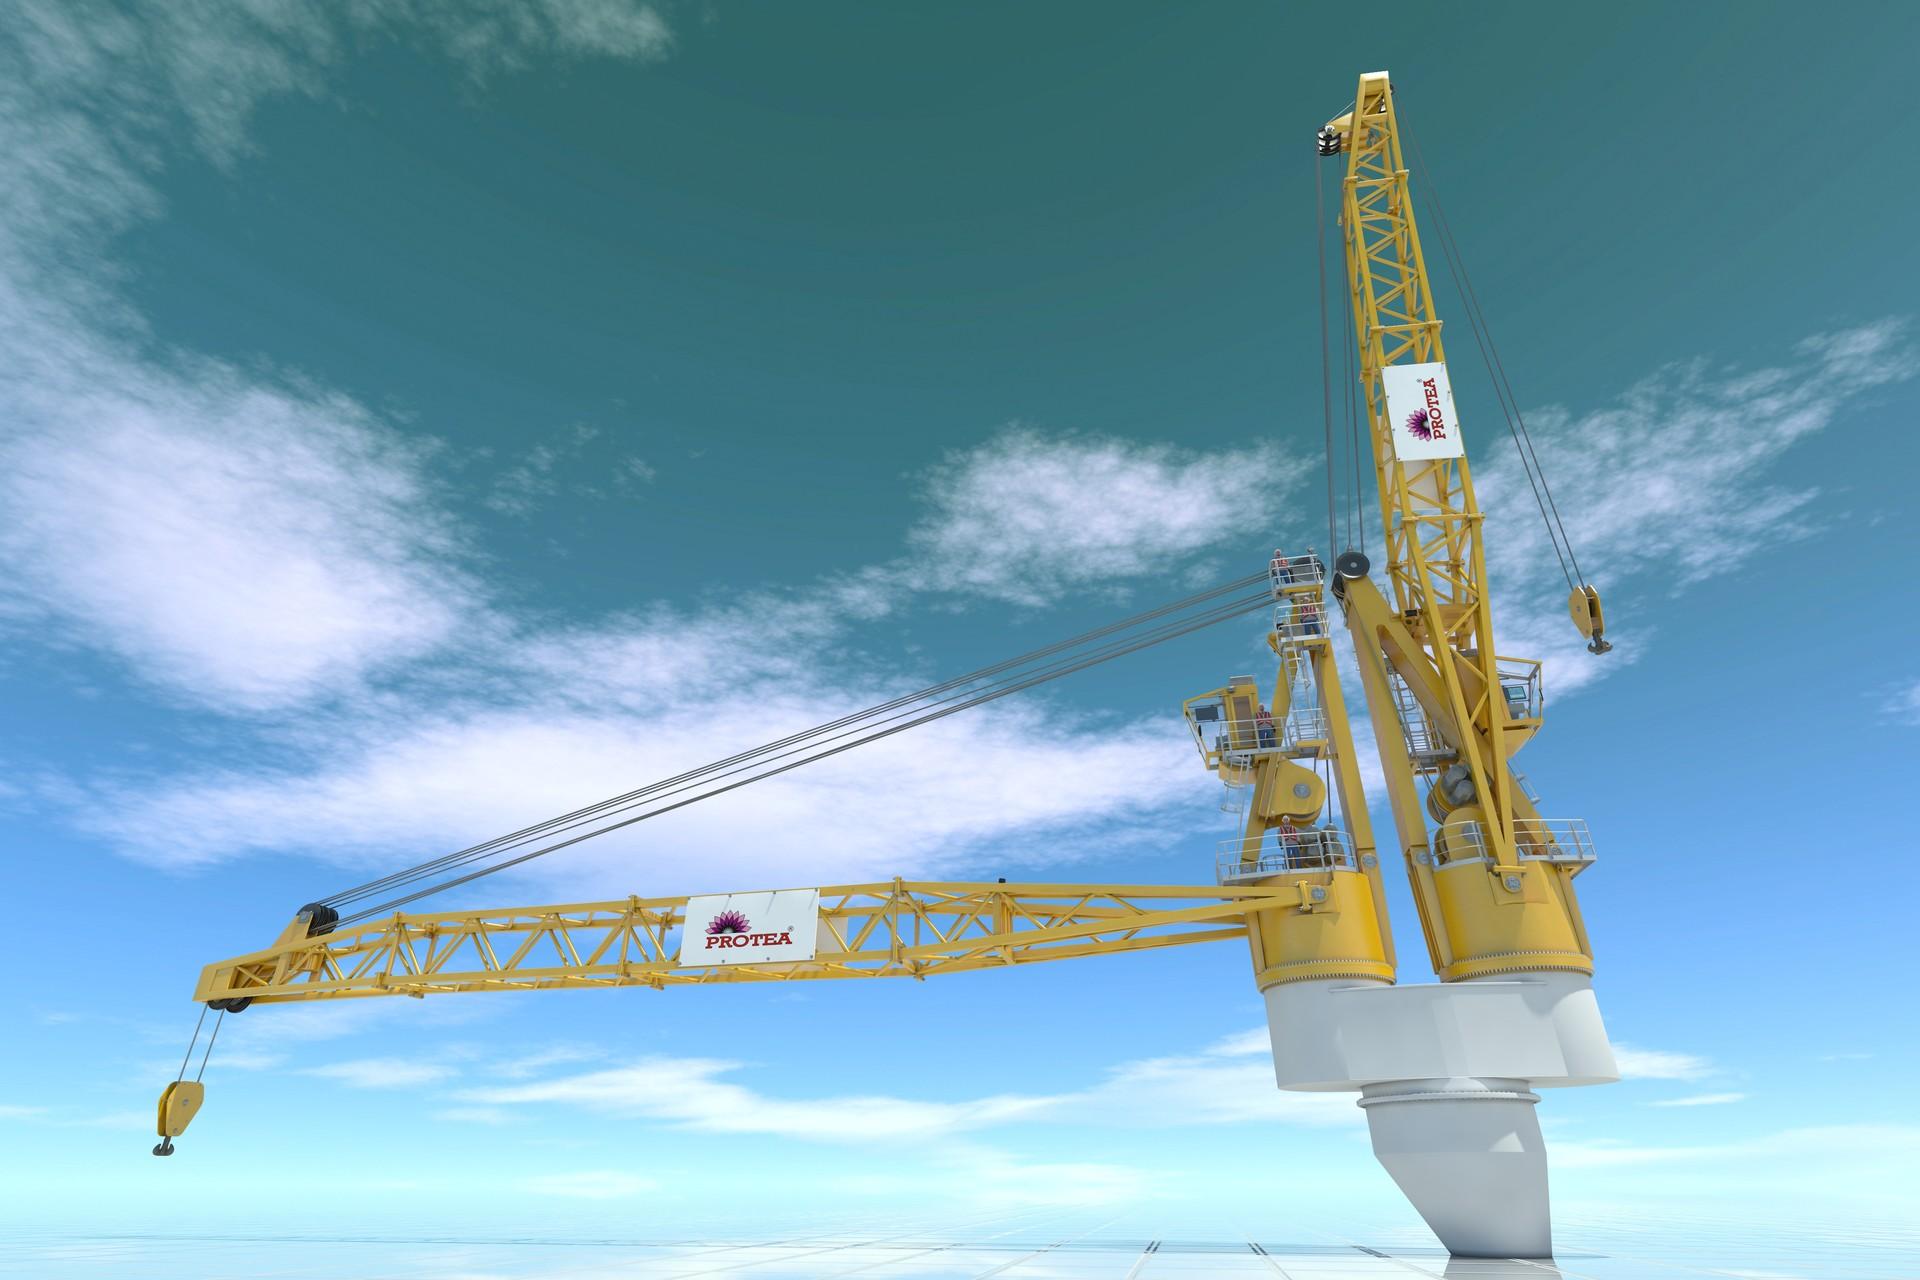 ArtStation - Lattice boom twin crane, Marcin Kobus